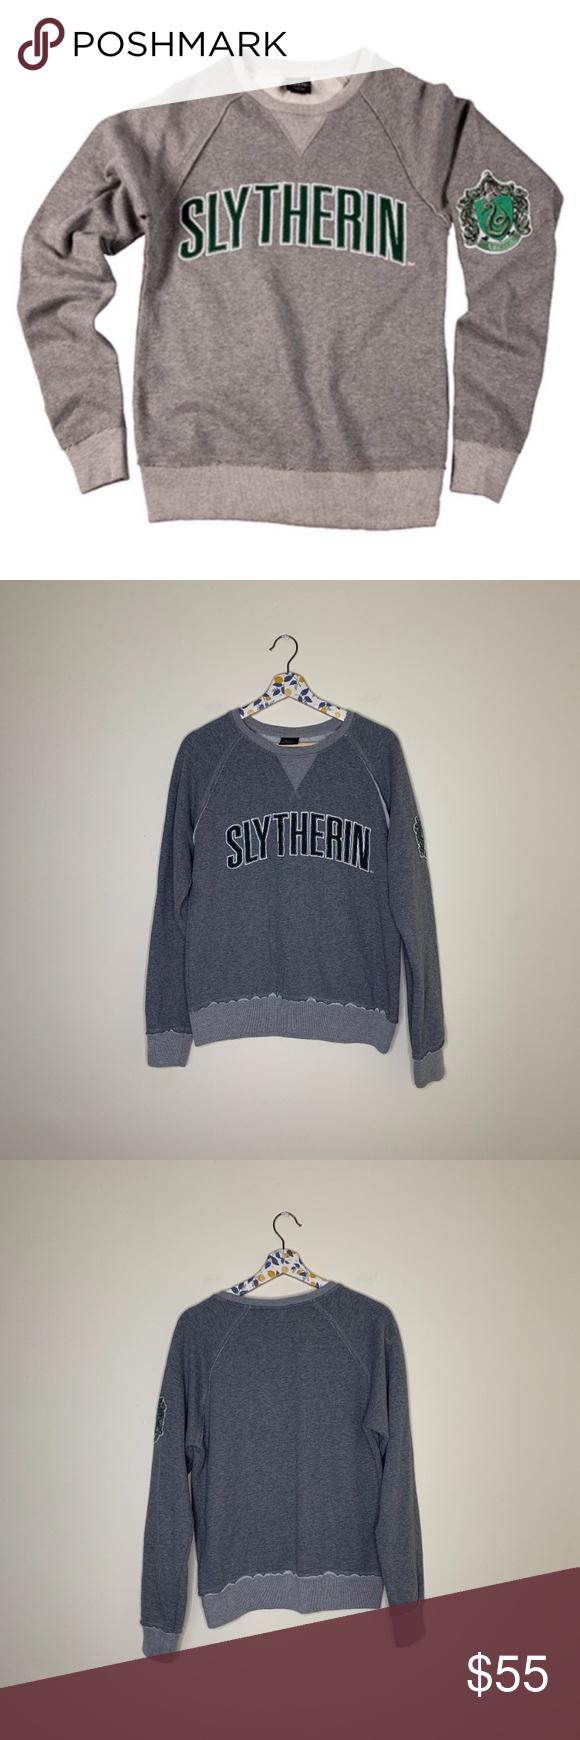 Harry Potter Slytherin House Gray Crewneck Sweater Harry Potter Slytherin House Gray Crewneck Sweater Size Sma Grey Crewneck Crew Neck Sweater Sweatshirt Tops [ 1740 x 580 Pixel ]